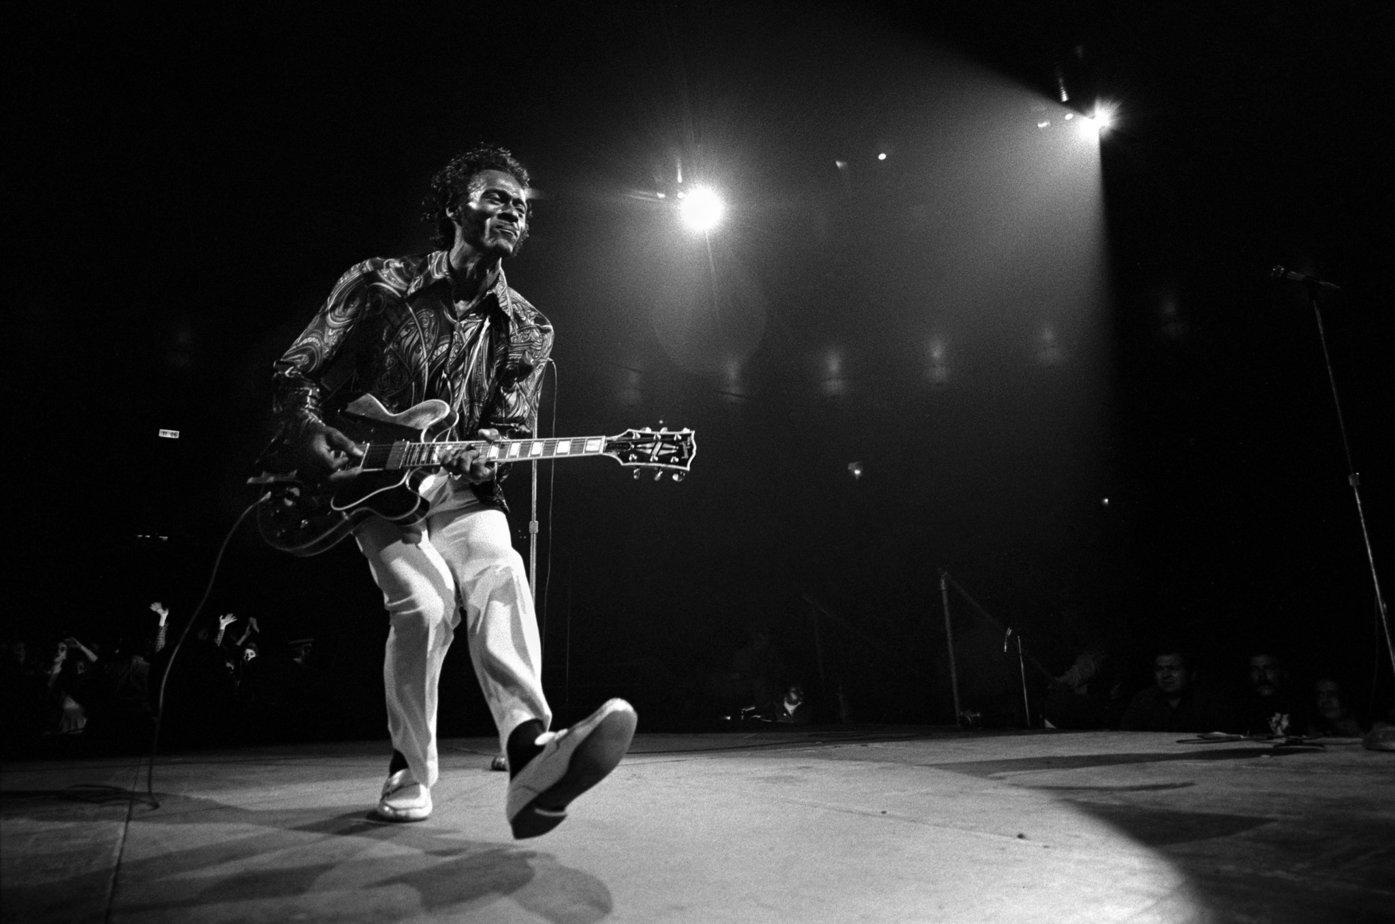 Chuck Berry playing guitar